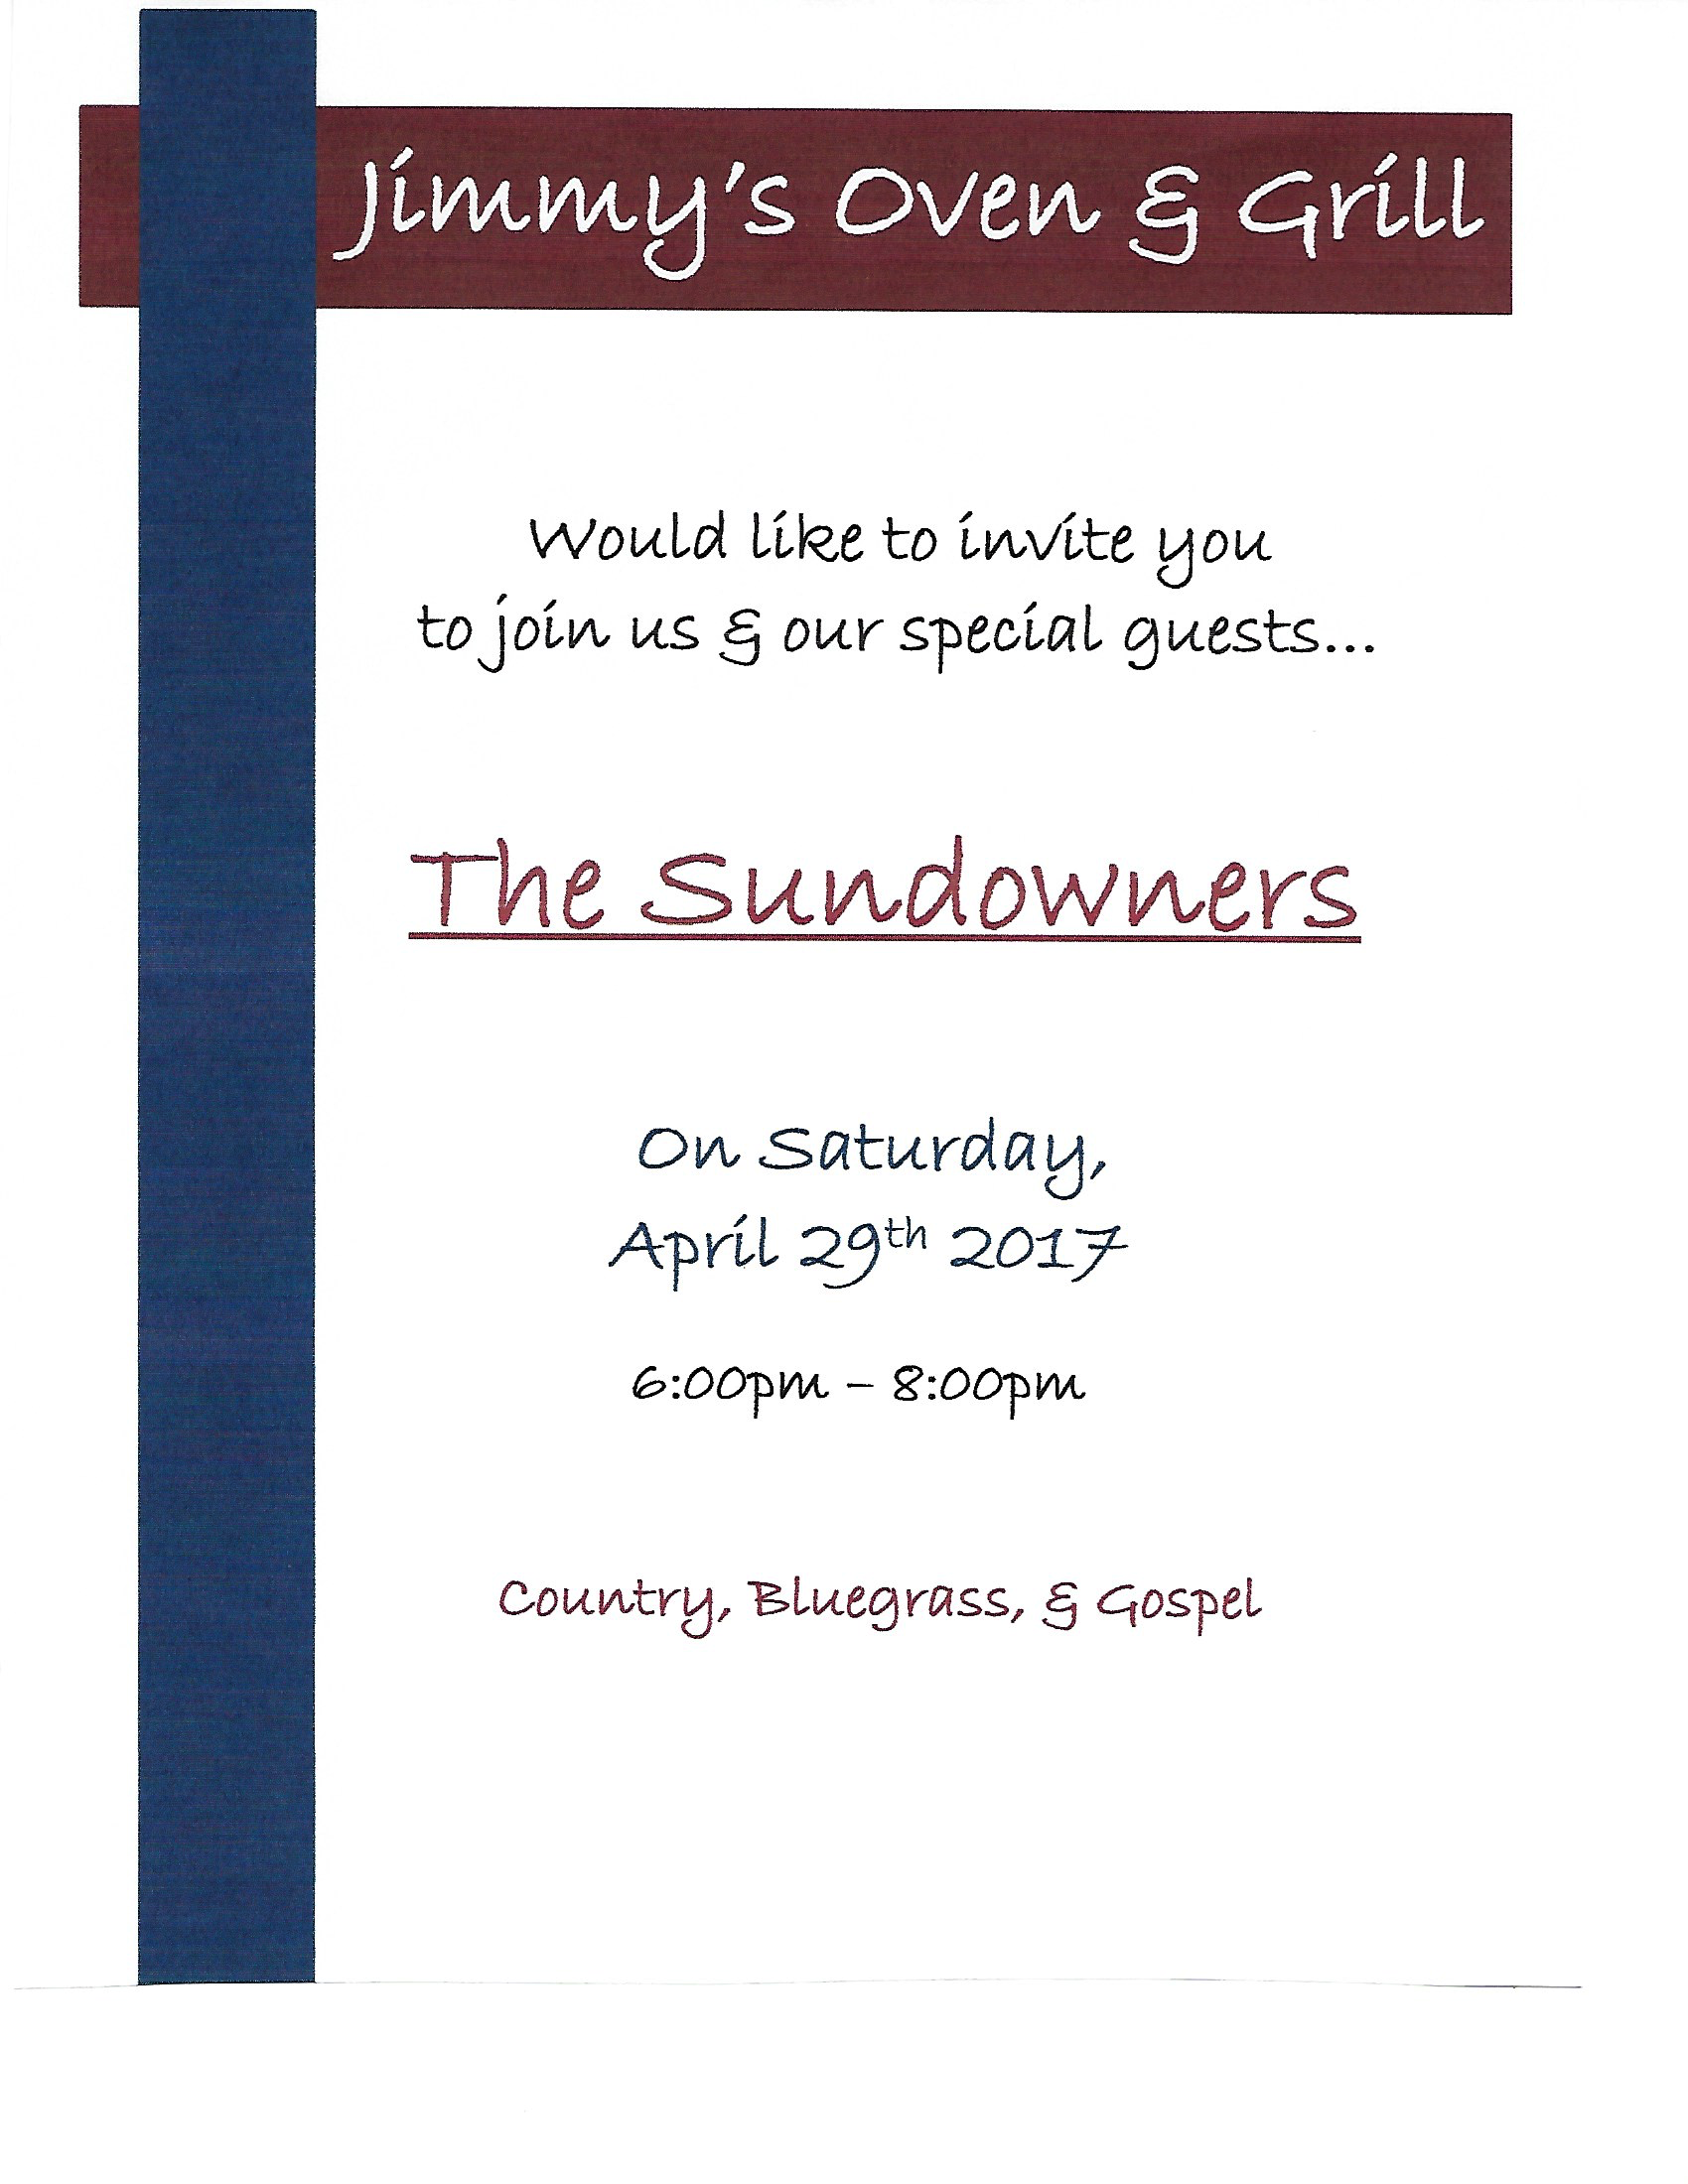 The Sundowners ping image